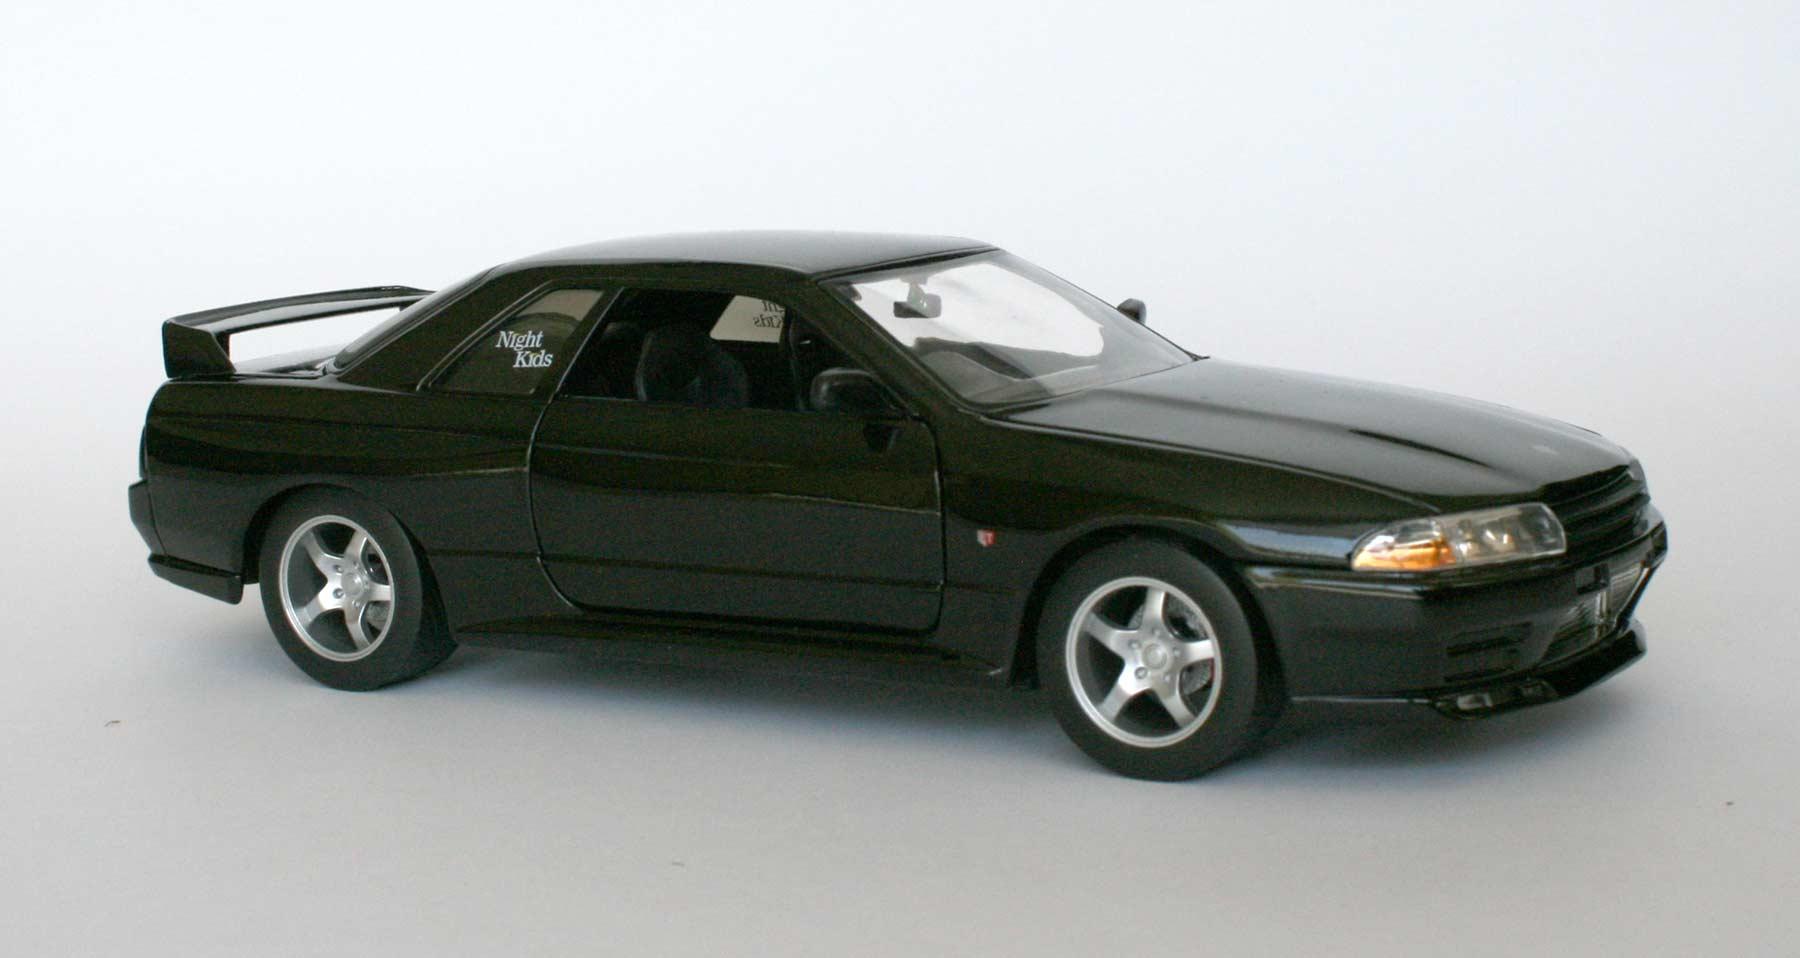 Initial_D_Nissan_GTR_Jada_Toys_Die_cast_22